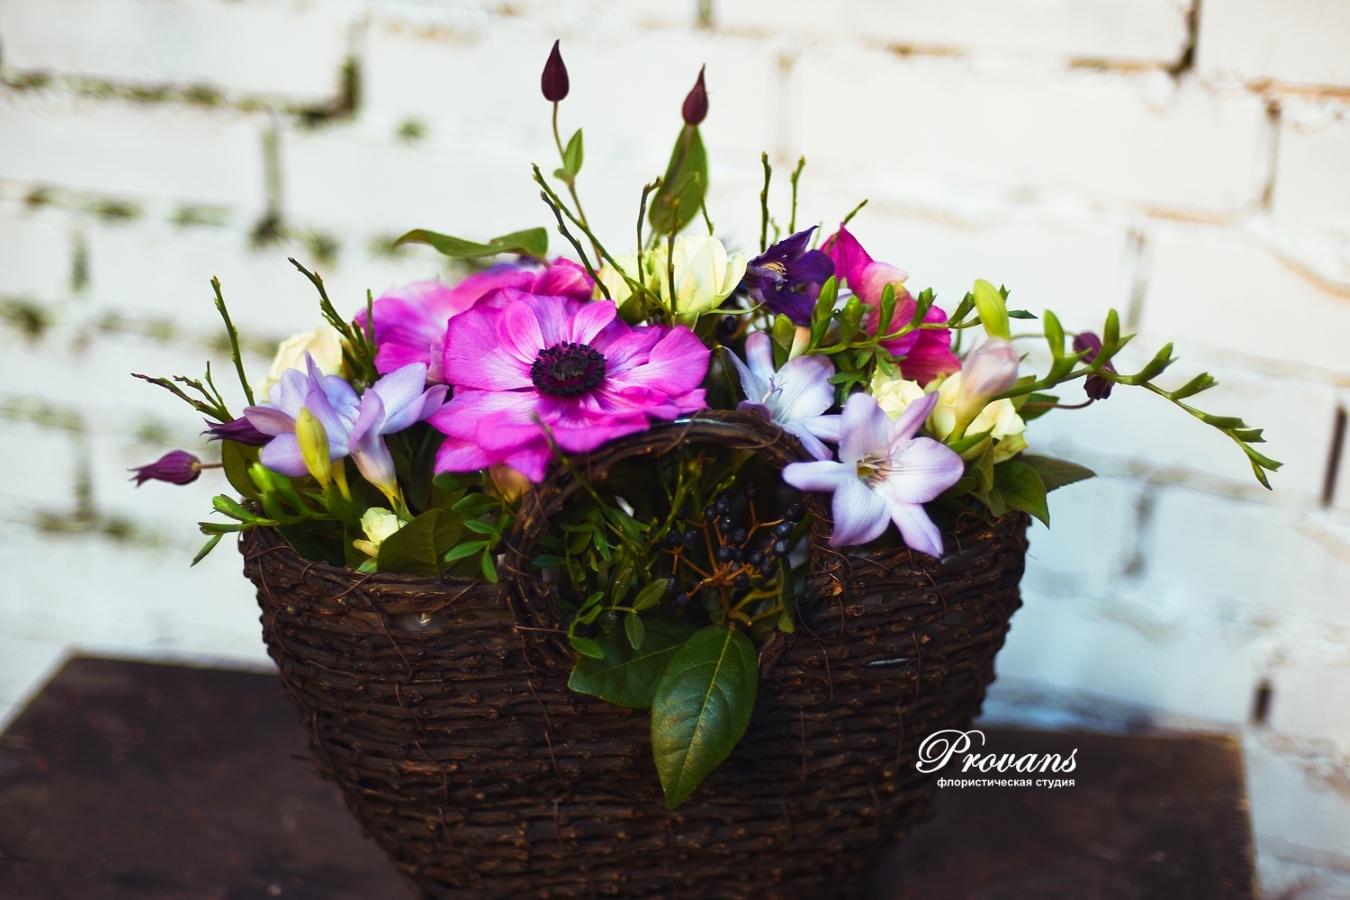 Корзина с весенними цветами. Анемоны, фрезия